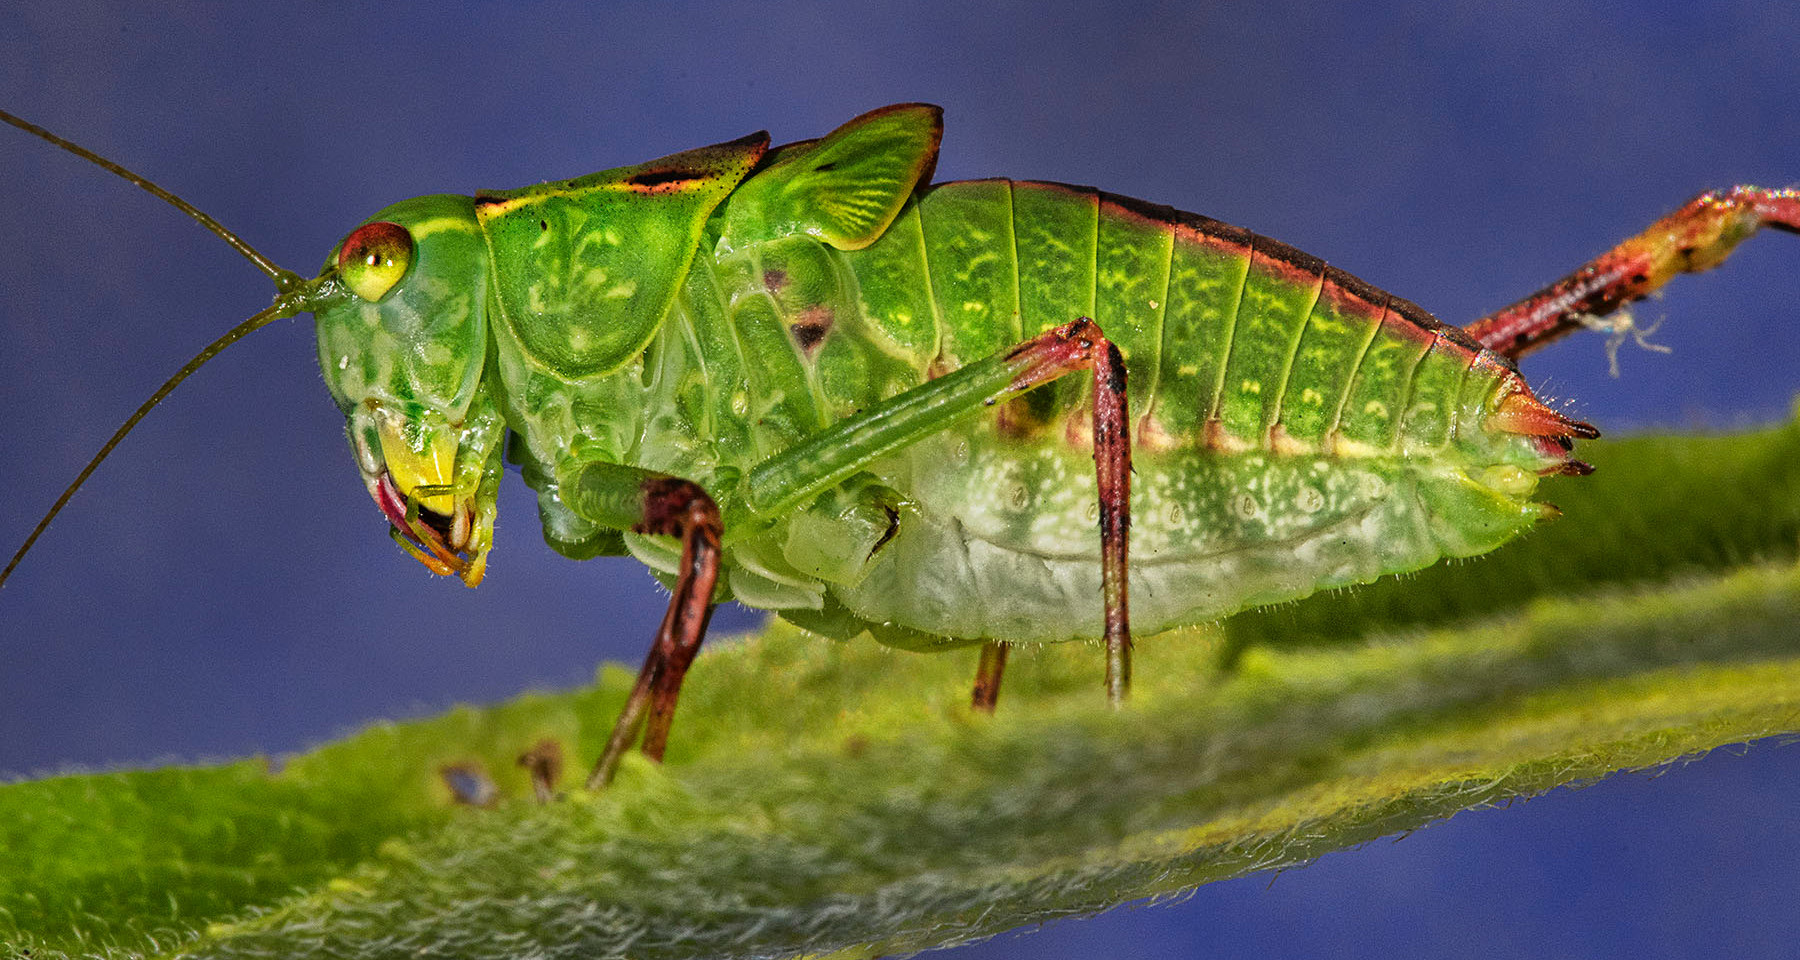 Grasshopper_043B-180711 copy.jpg